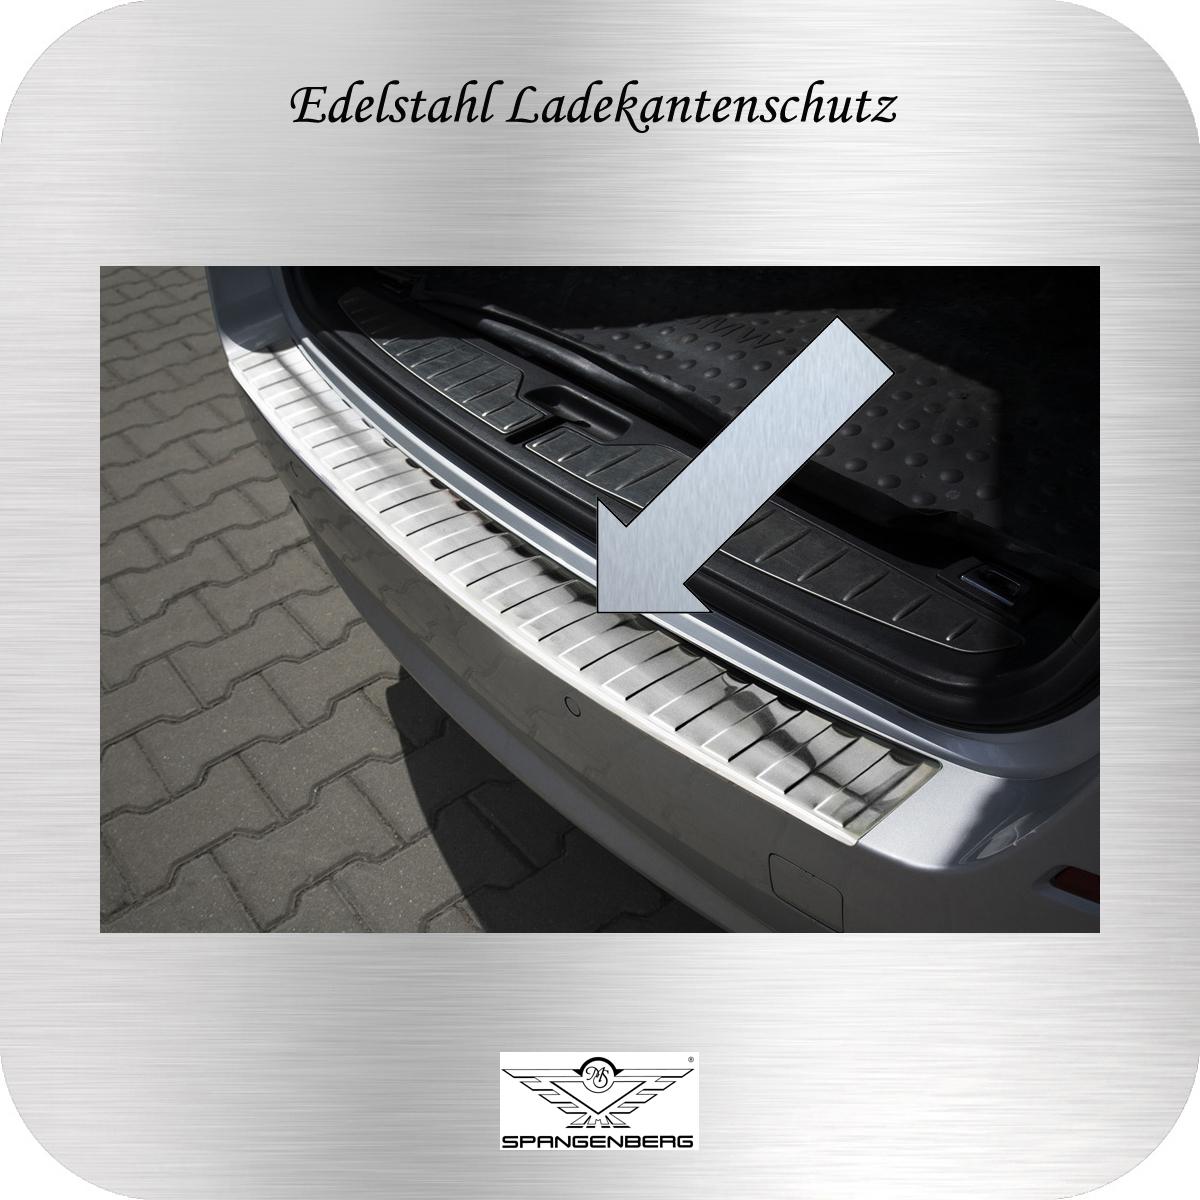 Ladekantenschutz Edelstahl BMW 5er Touring F11 Kombi 2010-2017 3235077